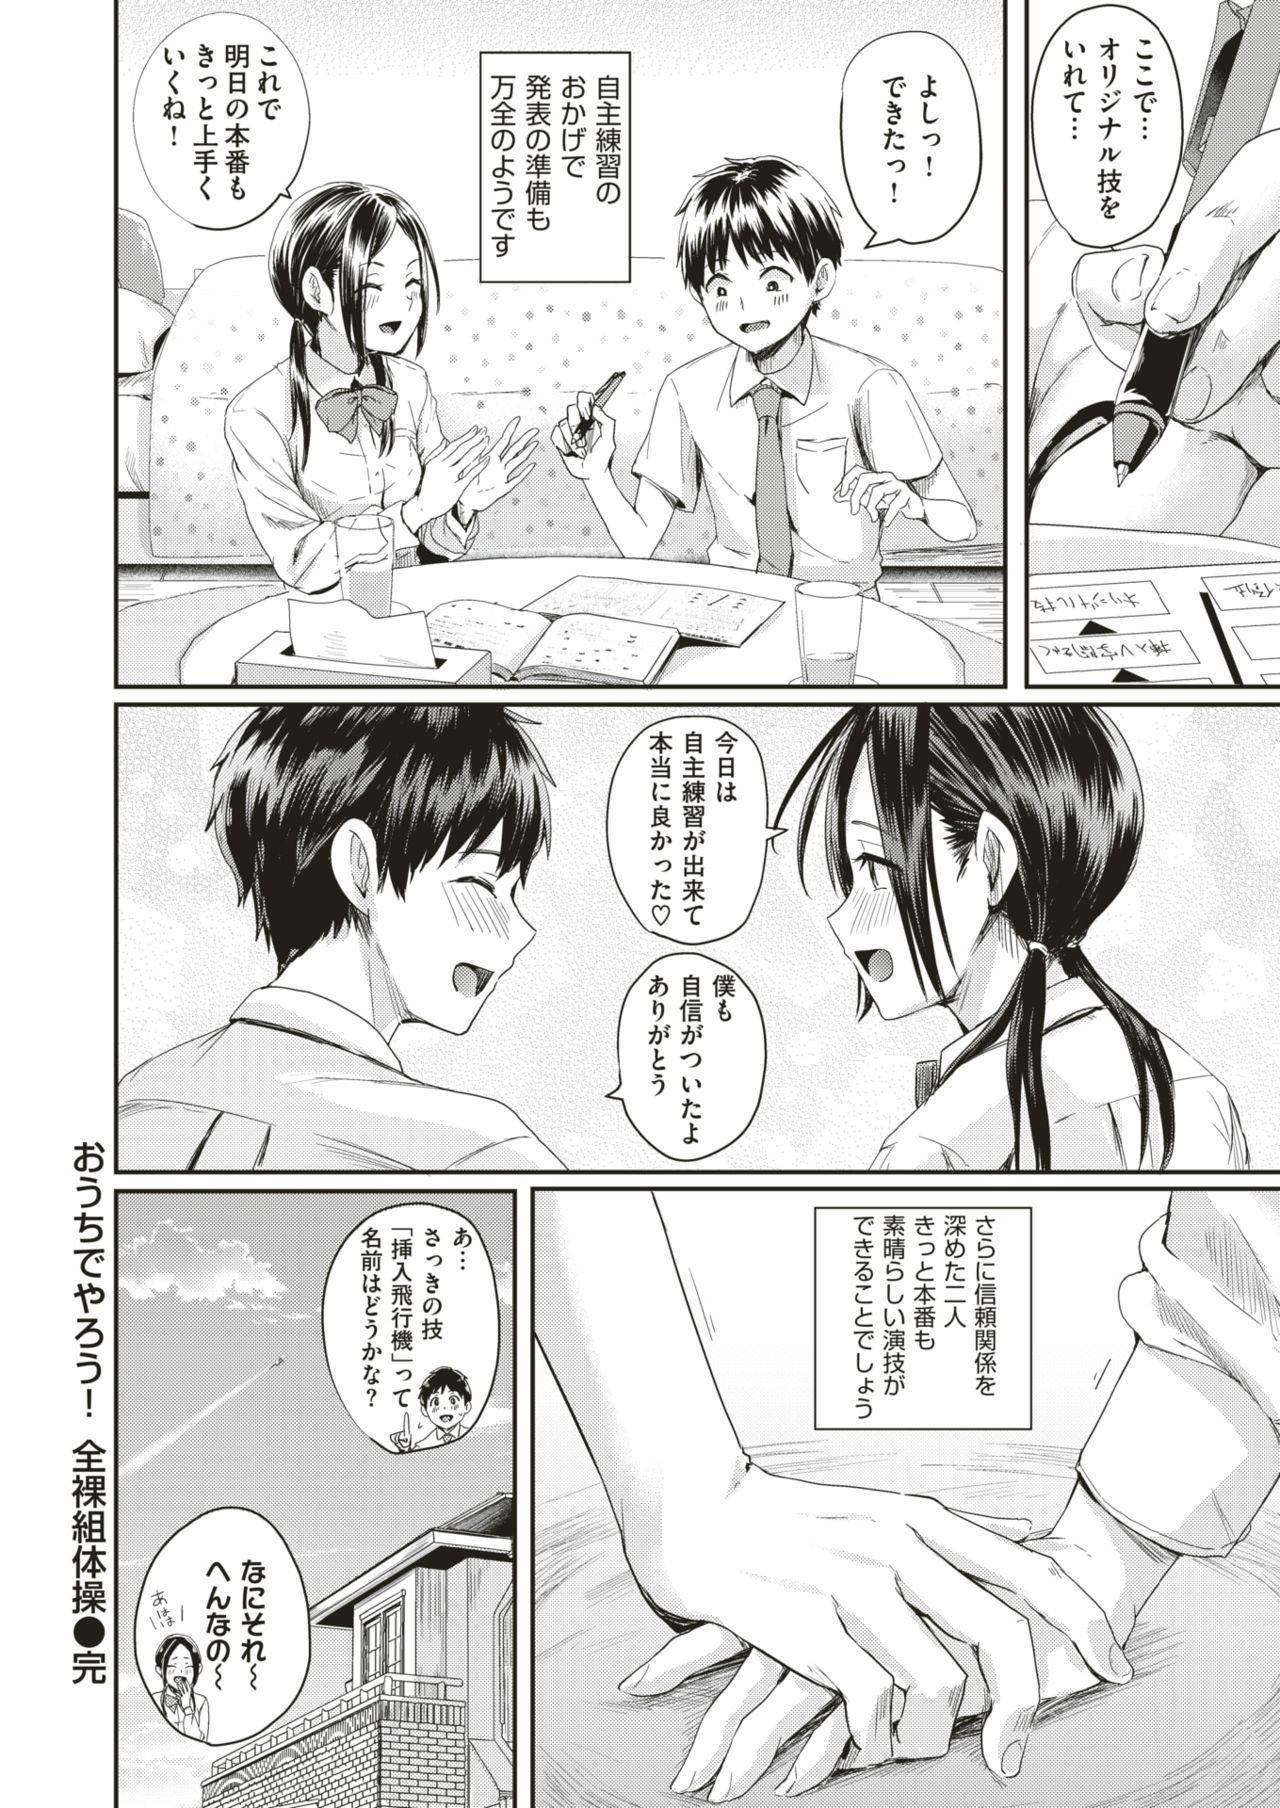 COMIC HAPPINING Vol. 4 18